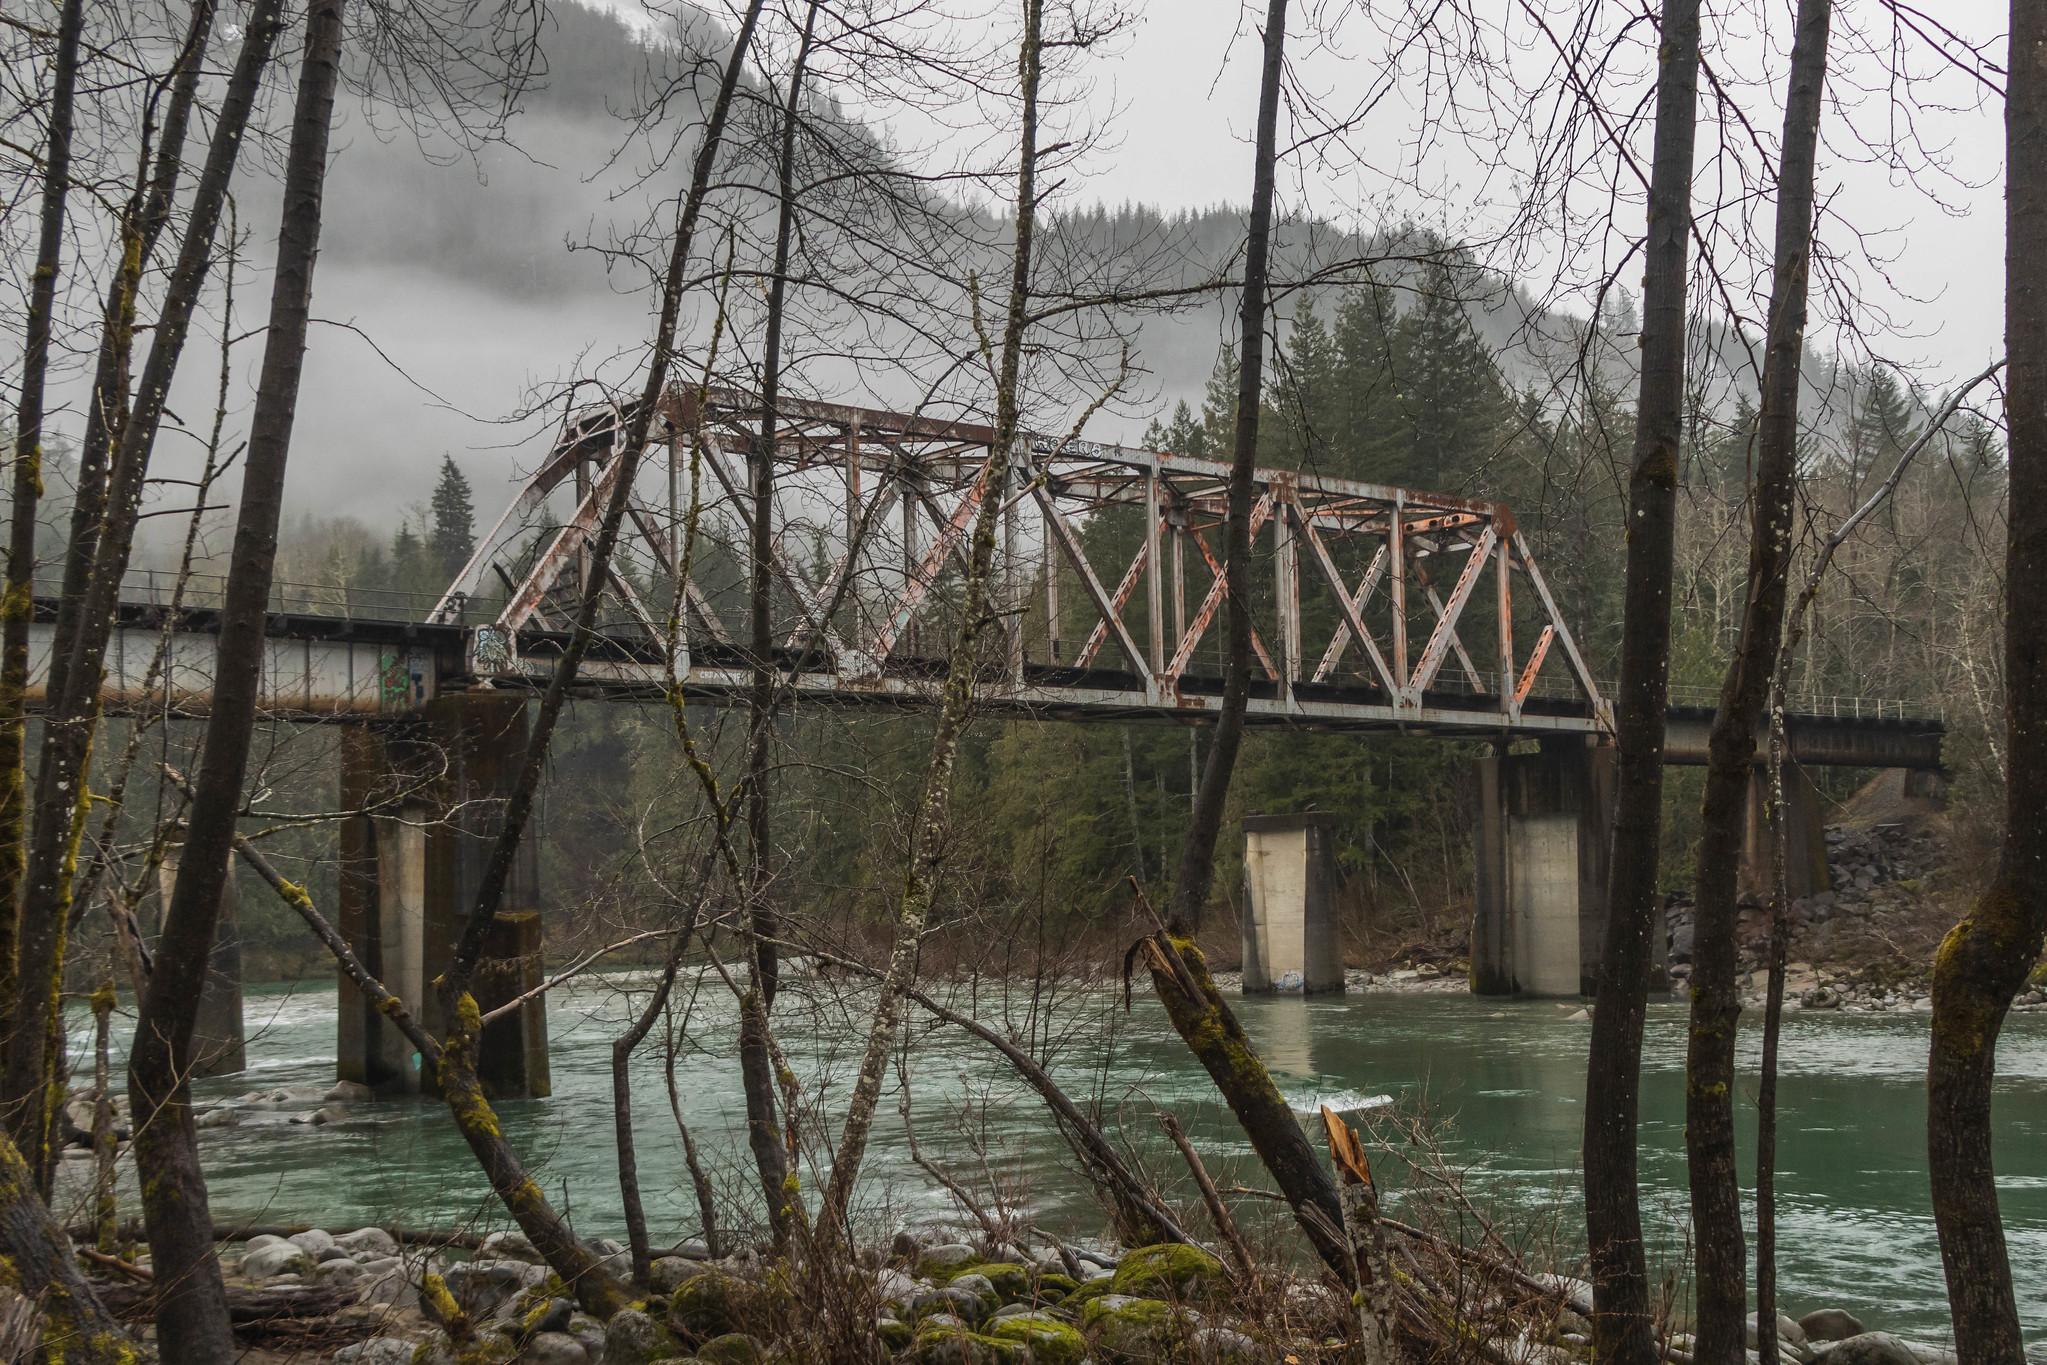 Trestle over Skykomish River